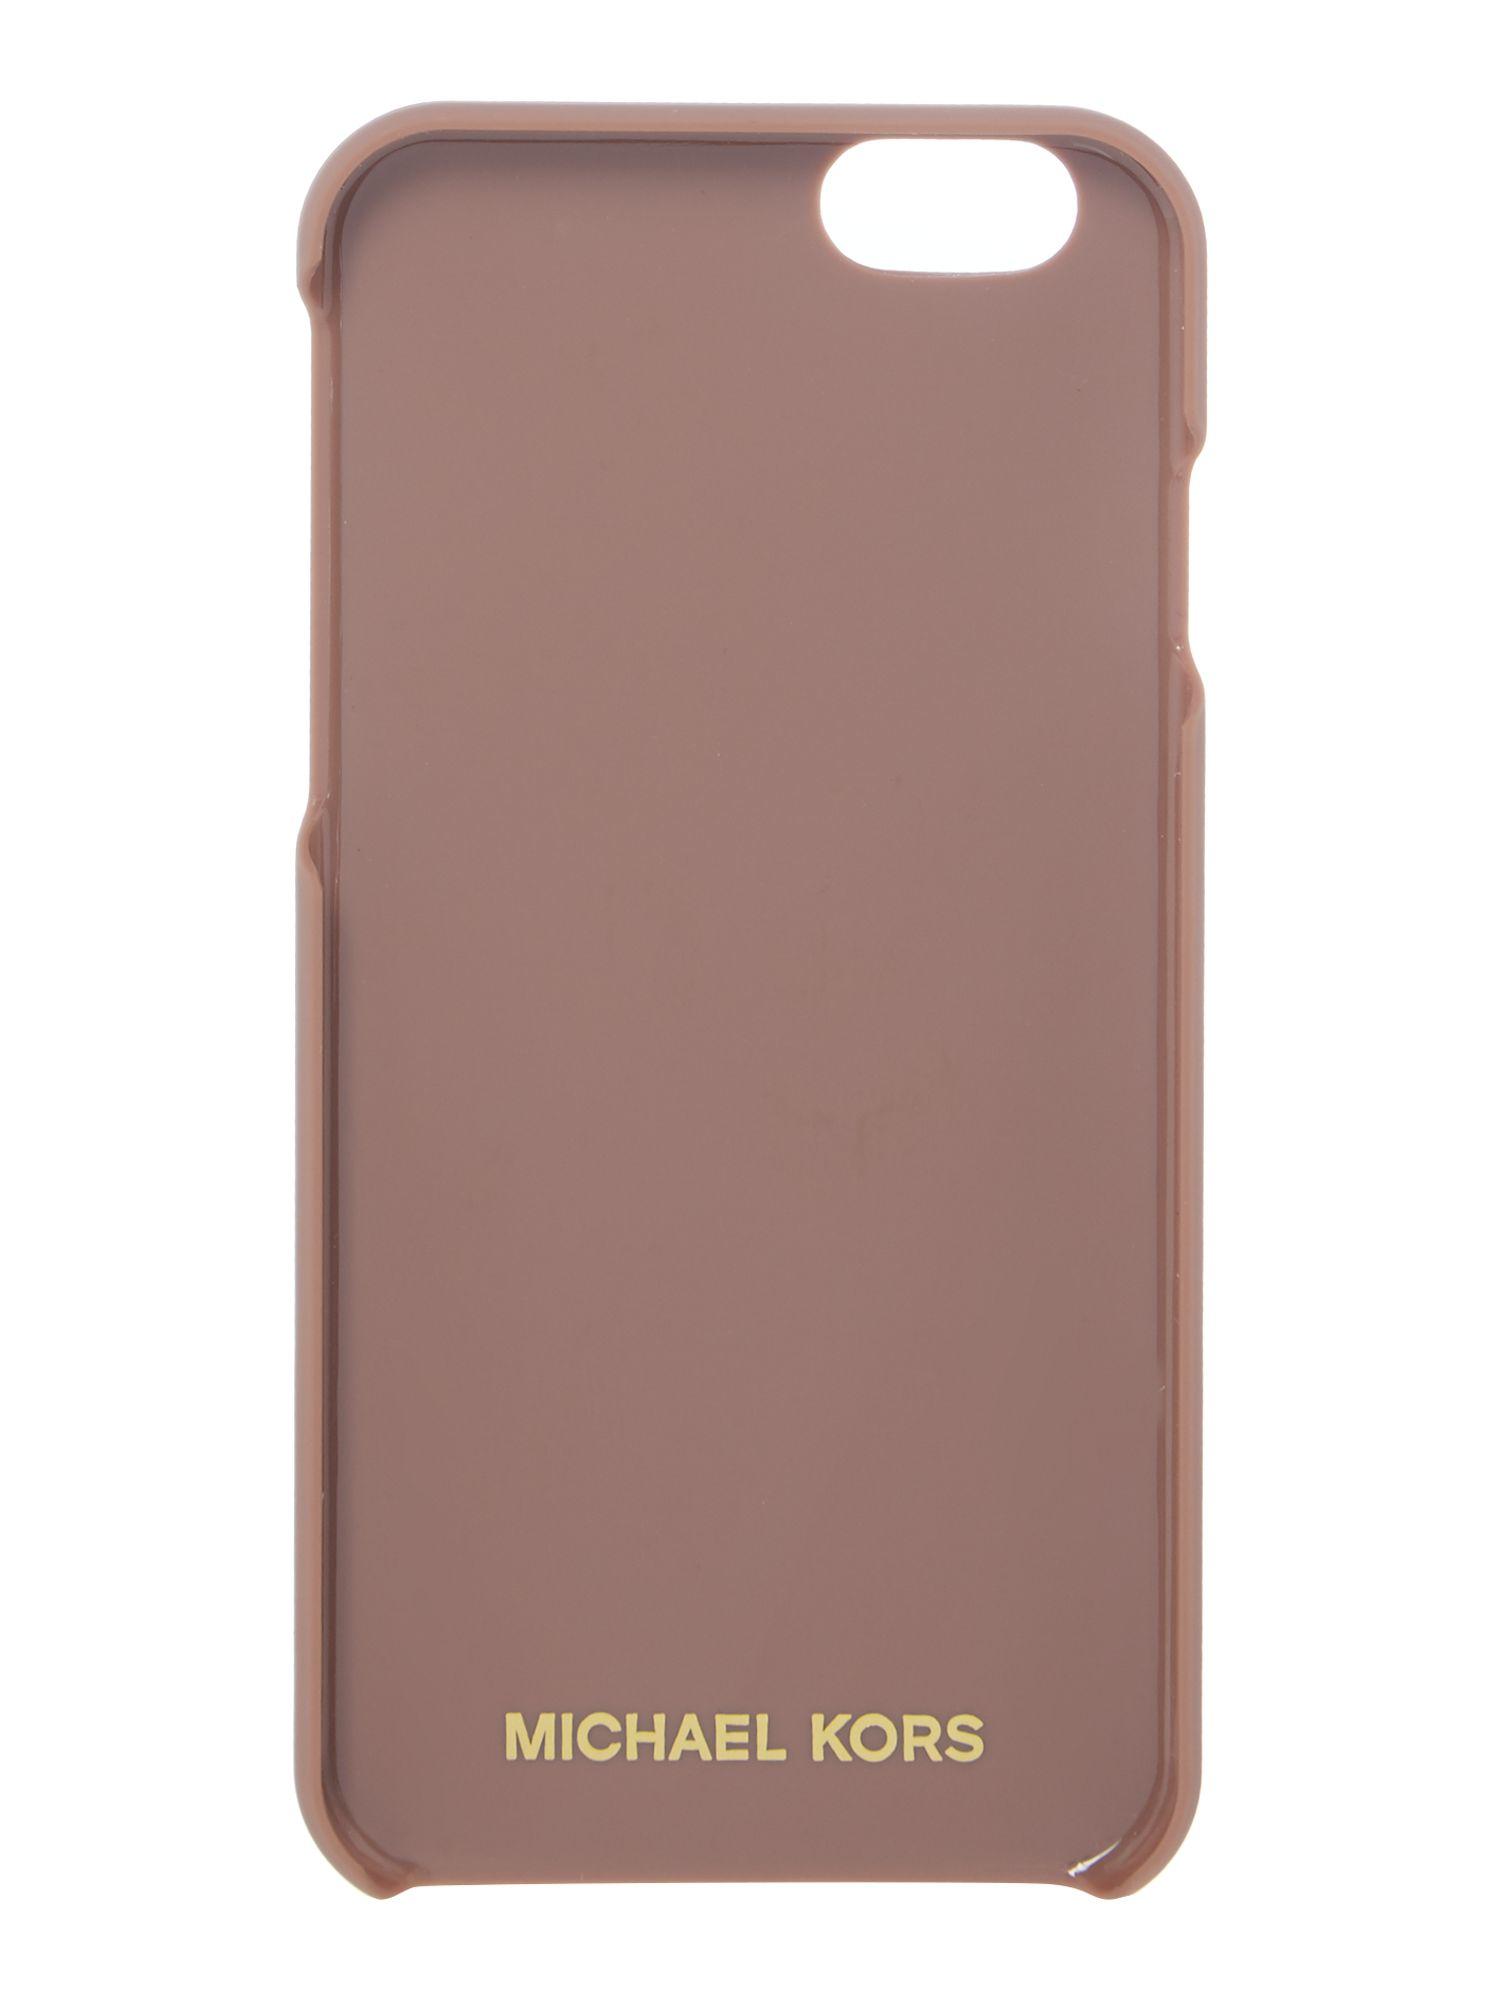 custodia iphone michael kors